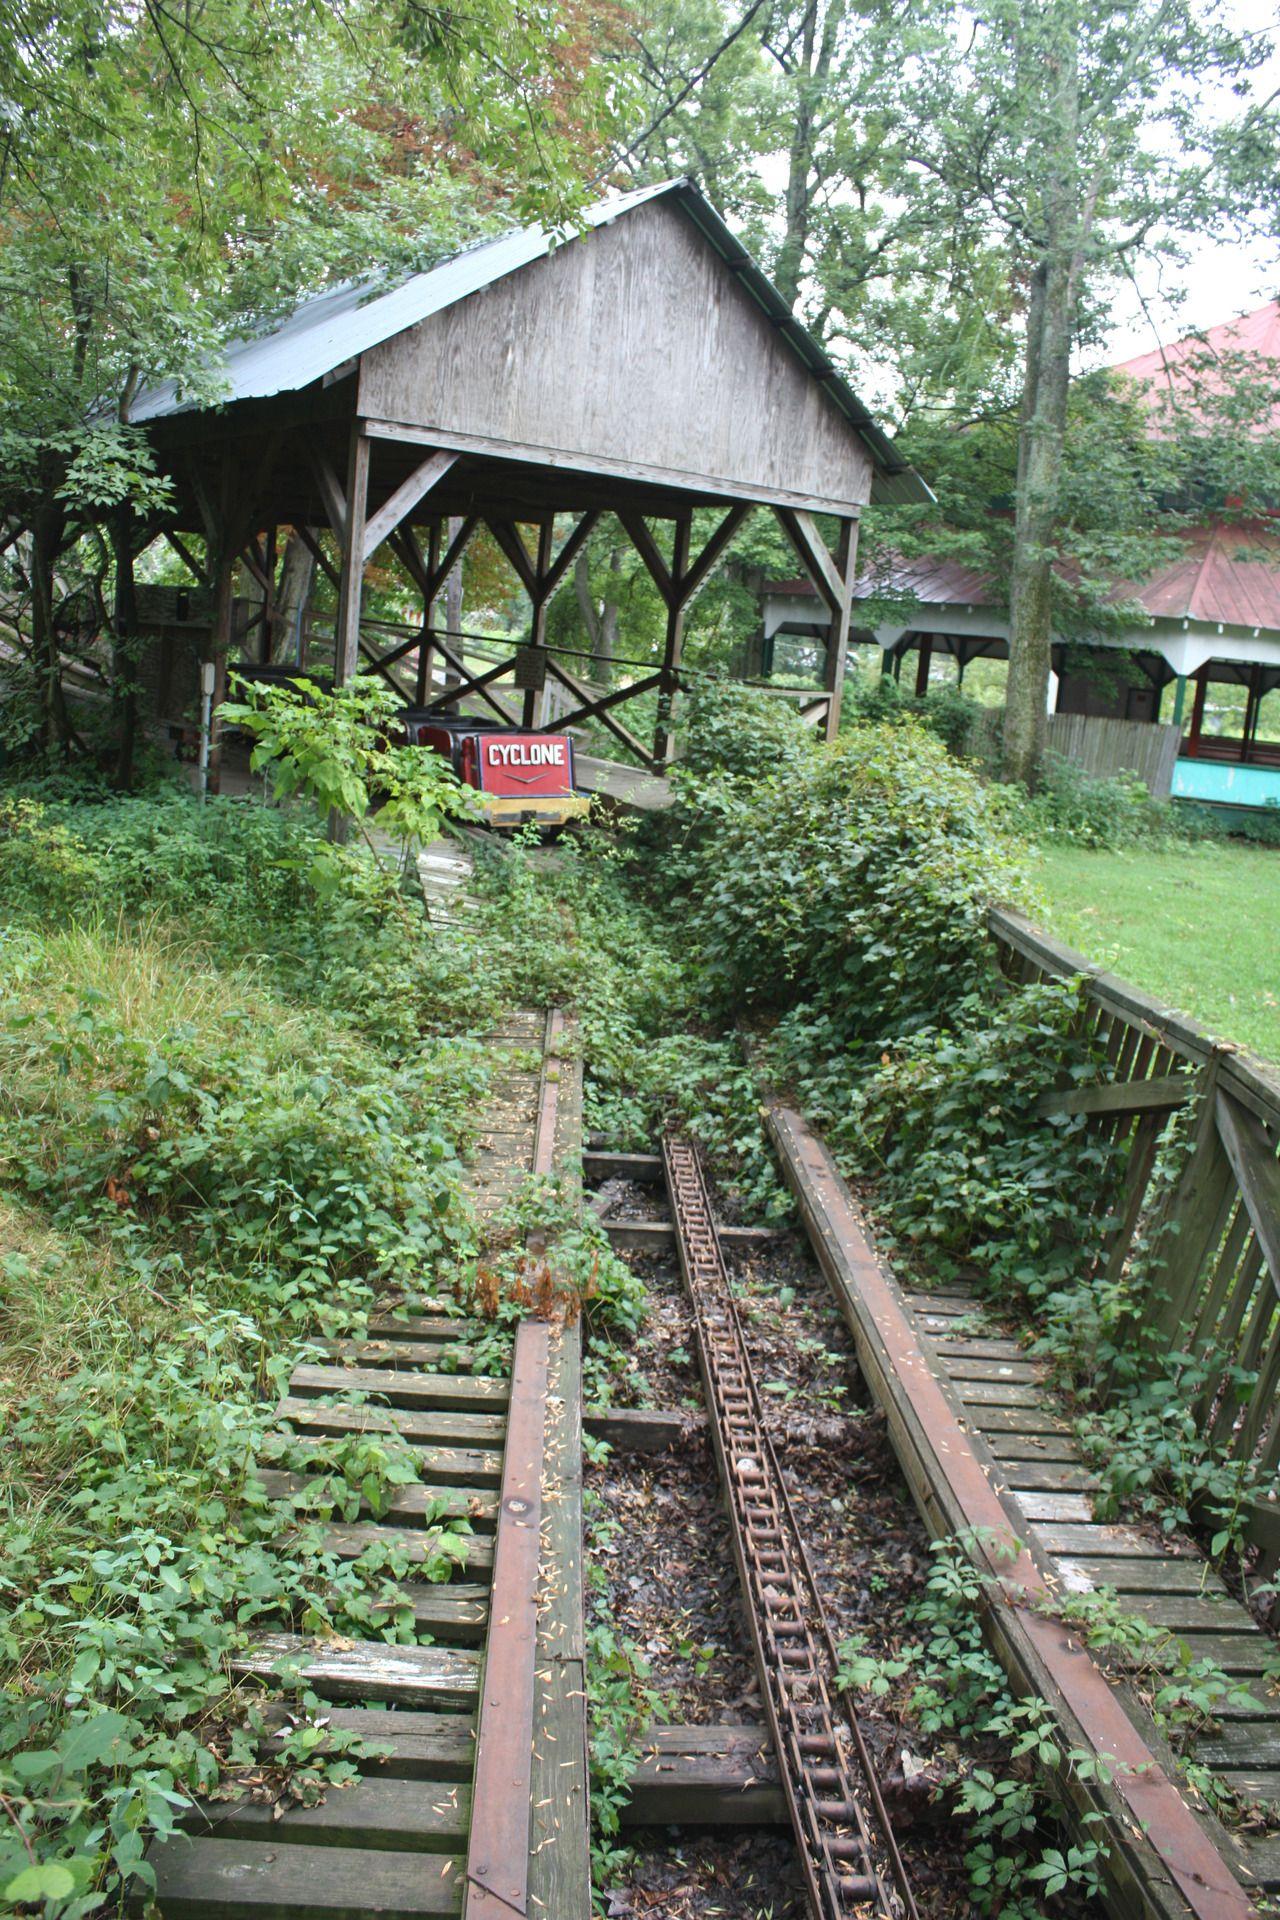 Pin By Chris Vigorito On Abandoned Amusement Parks Abandoned Theme Parks Abandoned Amusement Parks Abandoned Places